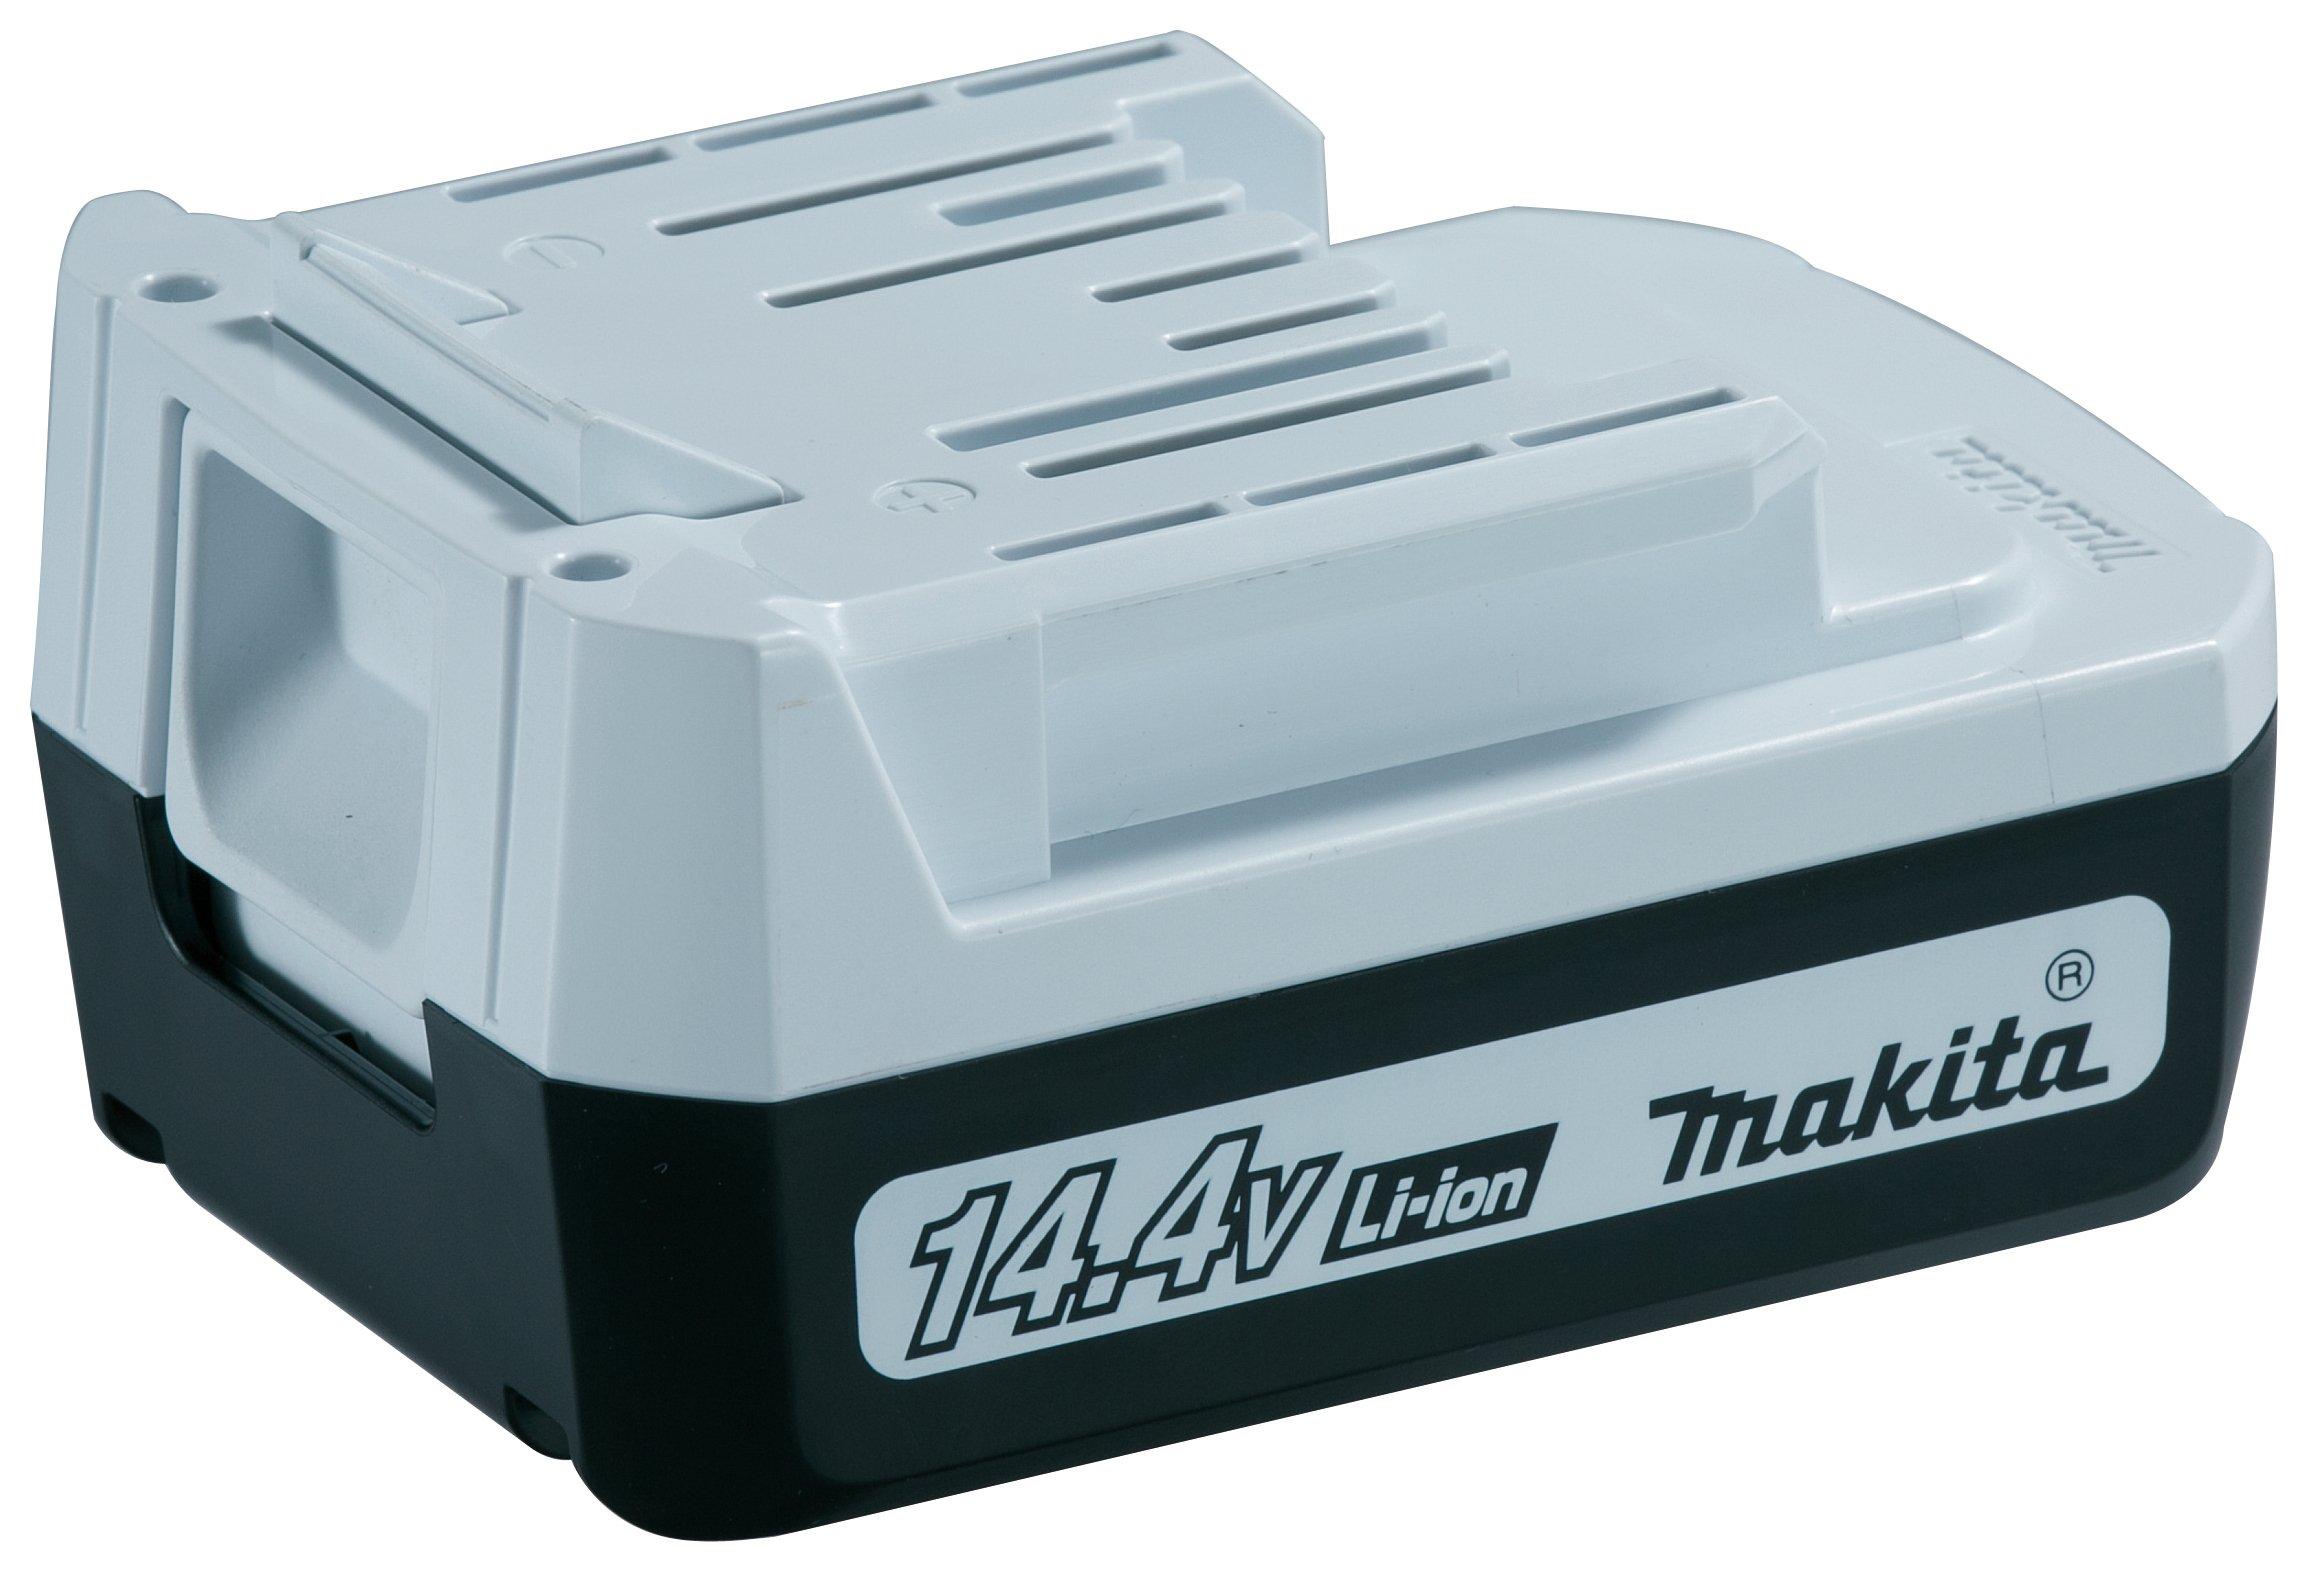 Makita - 144V 13Ah Li-Ion Battery Pack lowest price